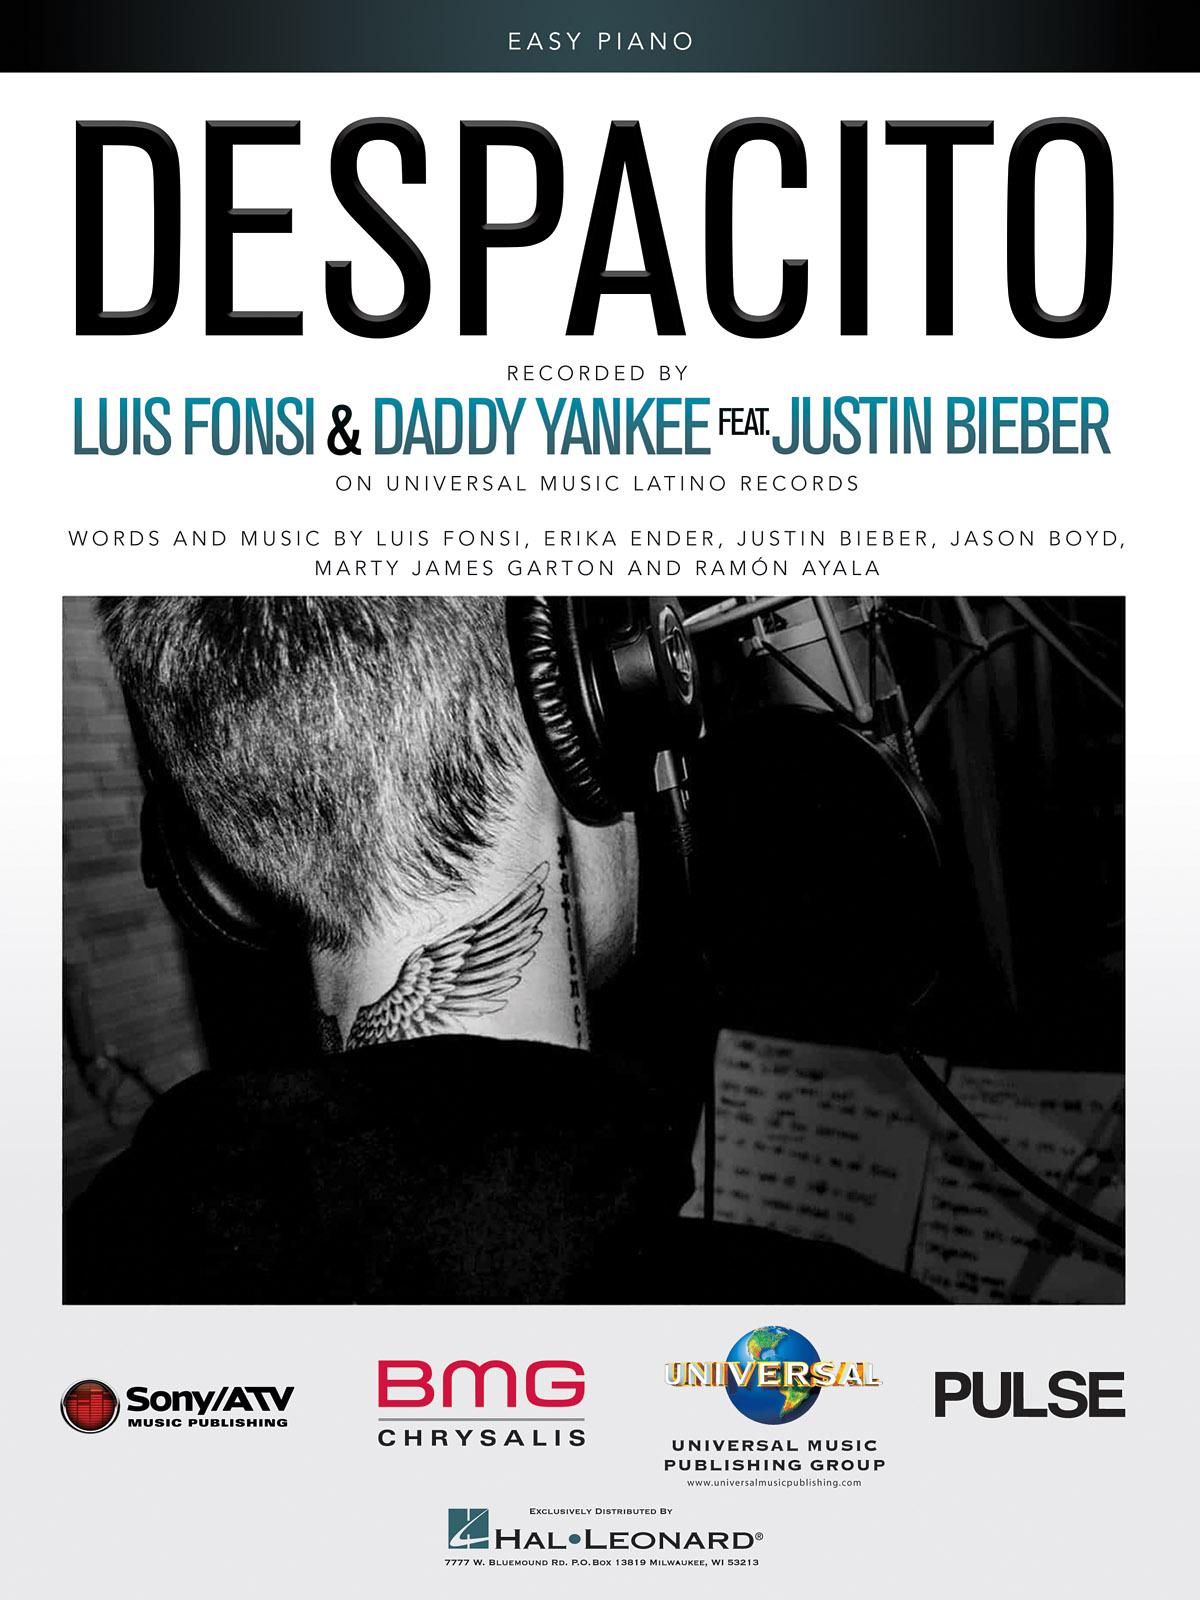 Luis Fonsi Daddy Yankee: Despacito: Easy Piano: Single Sheet